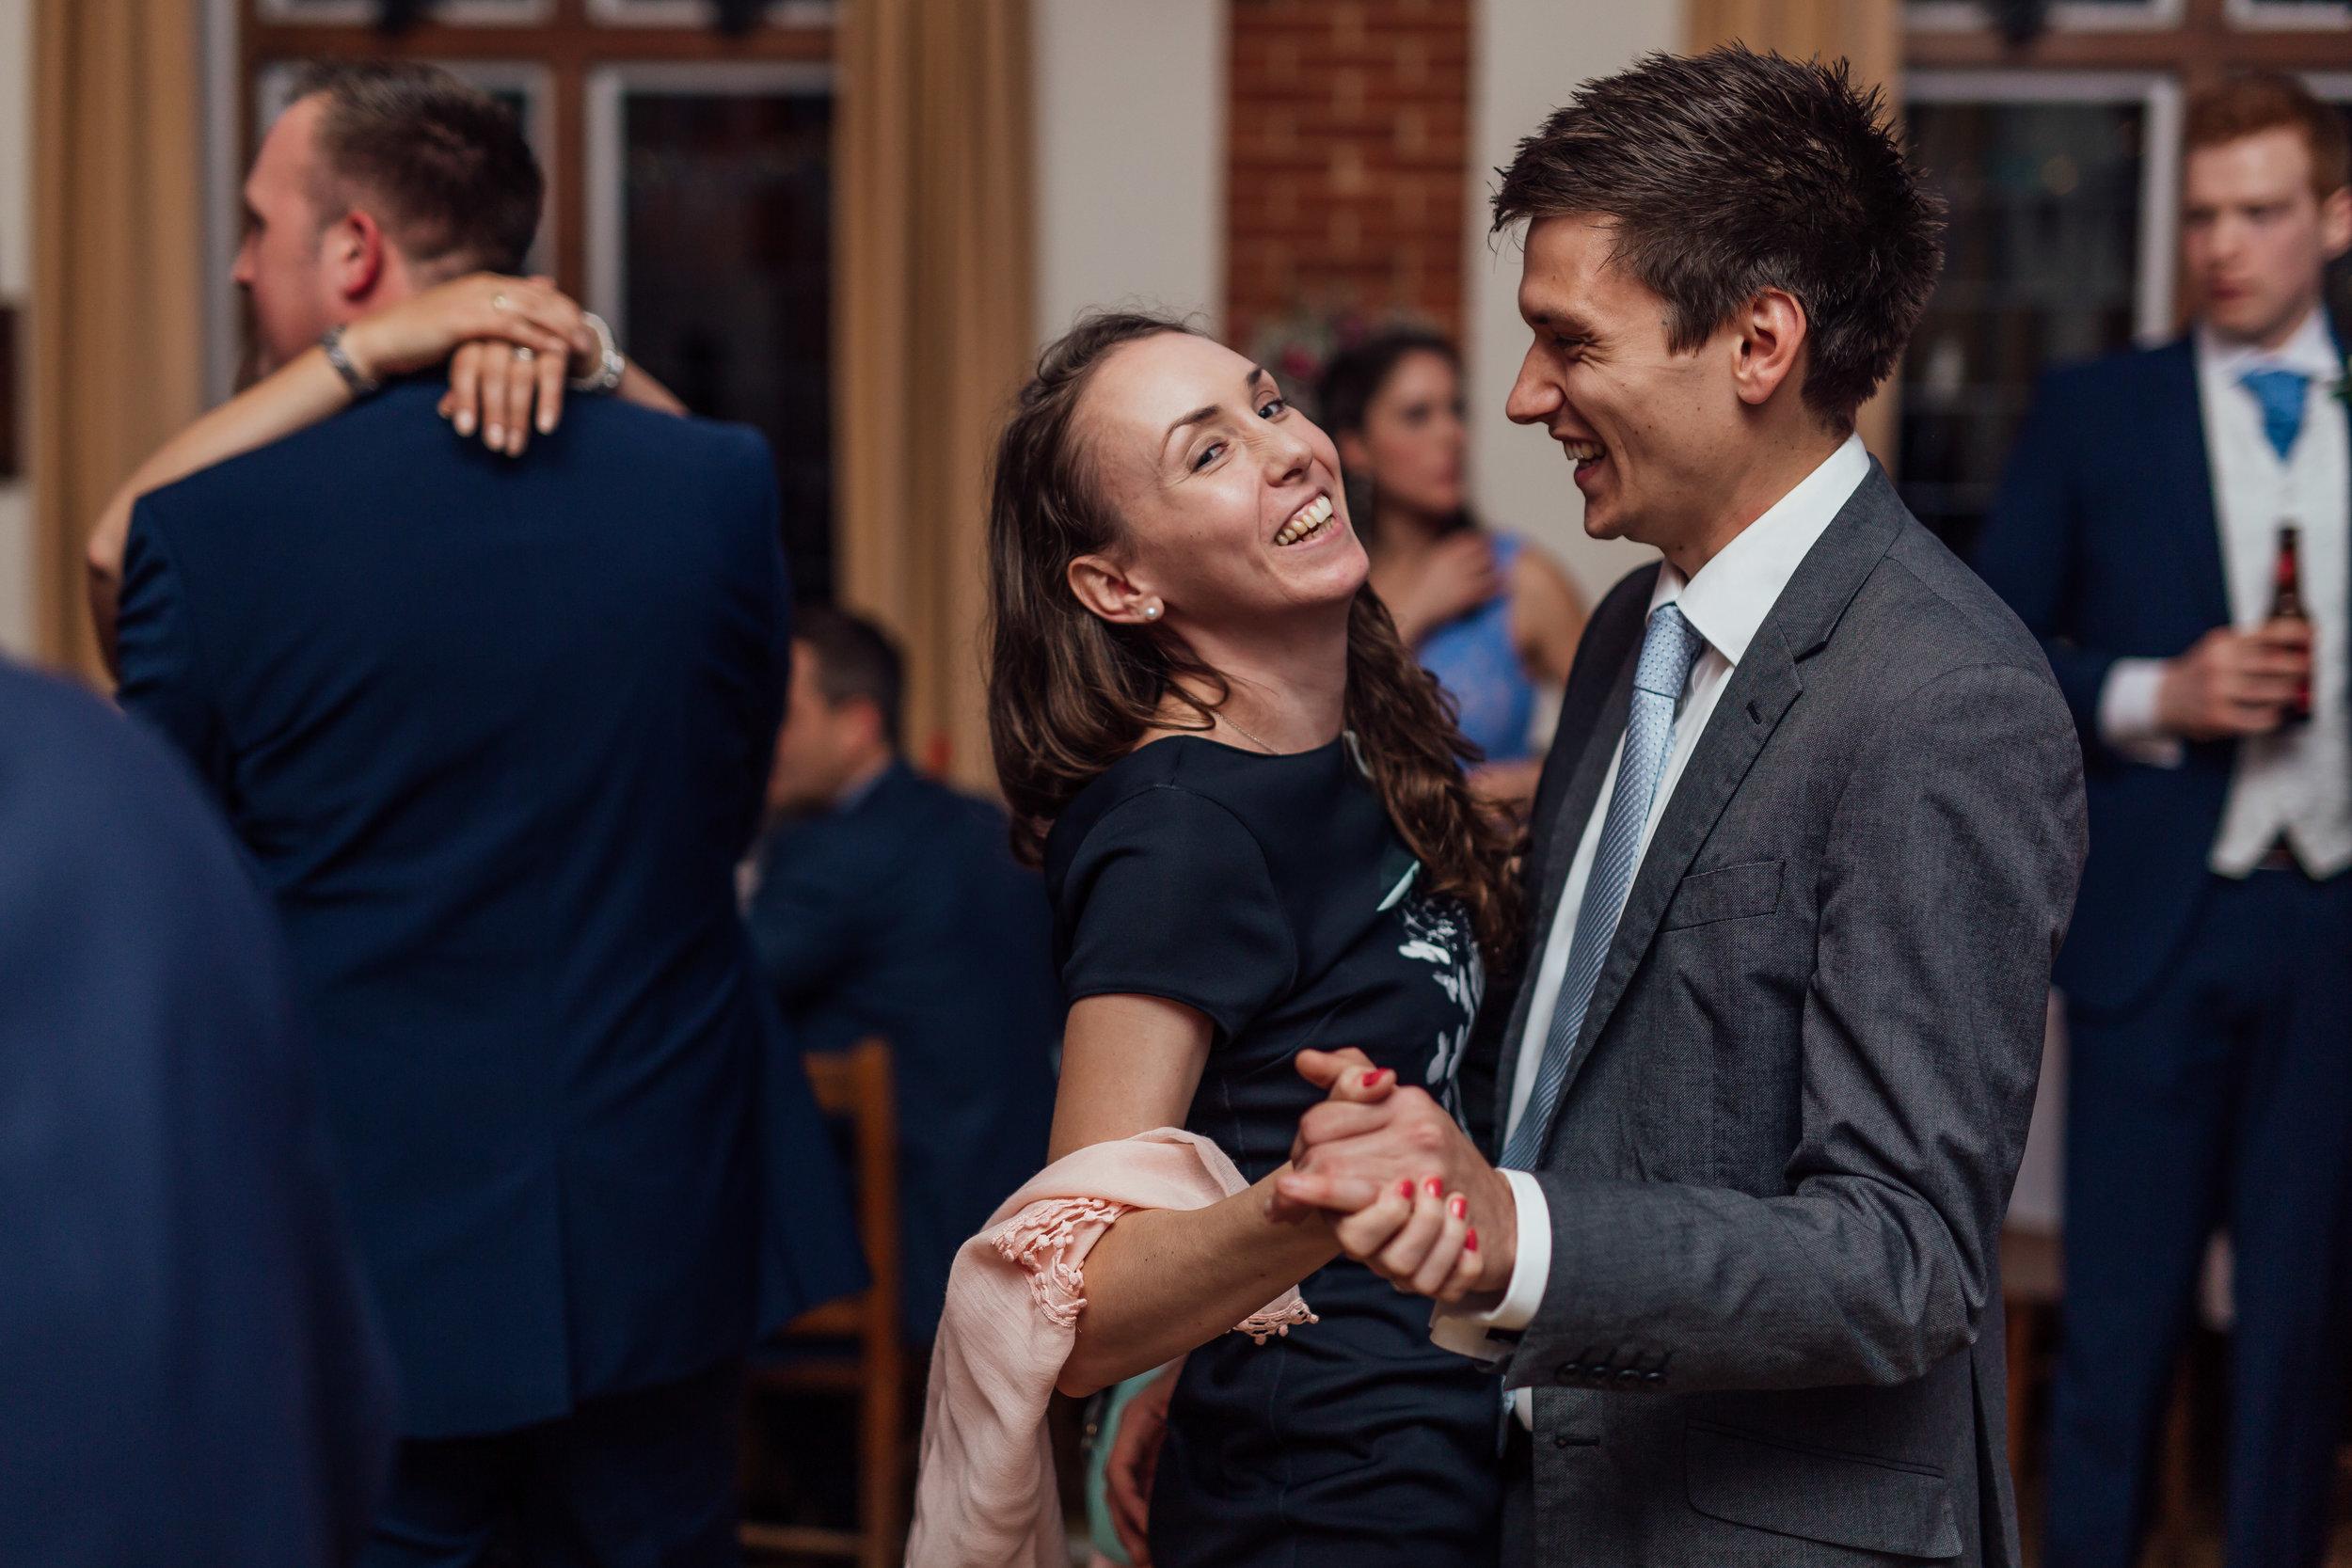 wedding-dancing-rotherwick-village-hall-wedding-hampshire / Hampshire-wedding-photographer-hampshire / village-hall-wedding